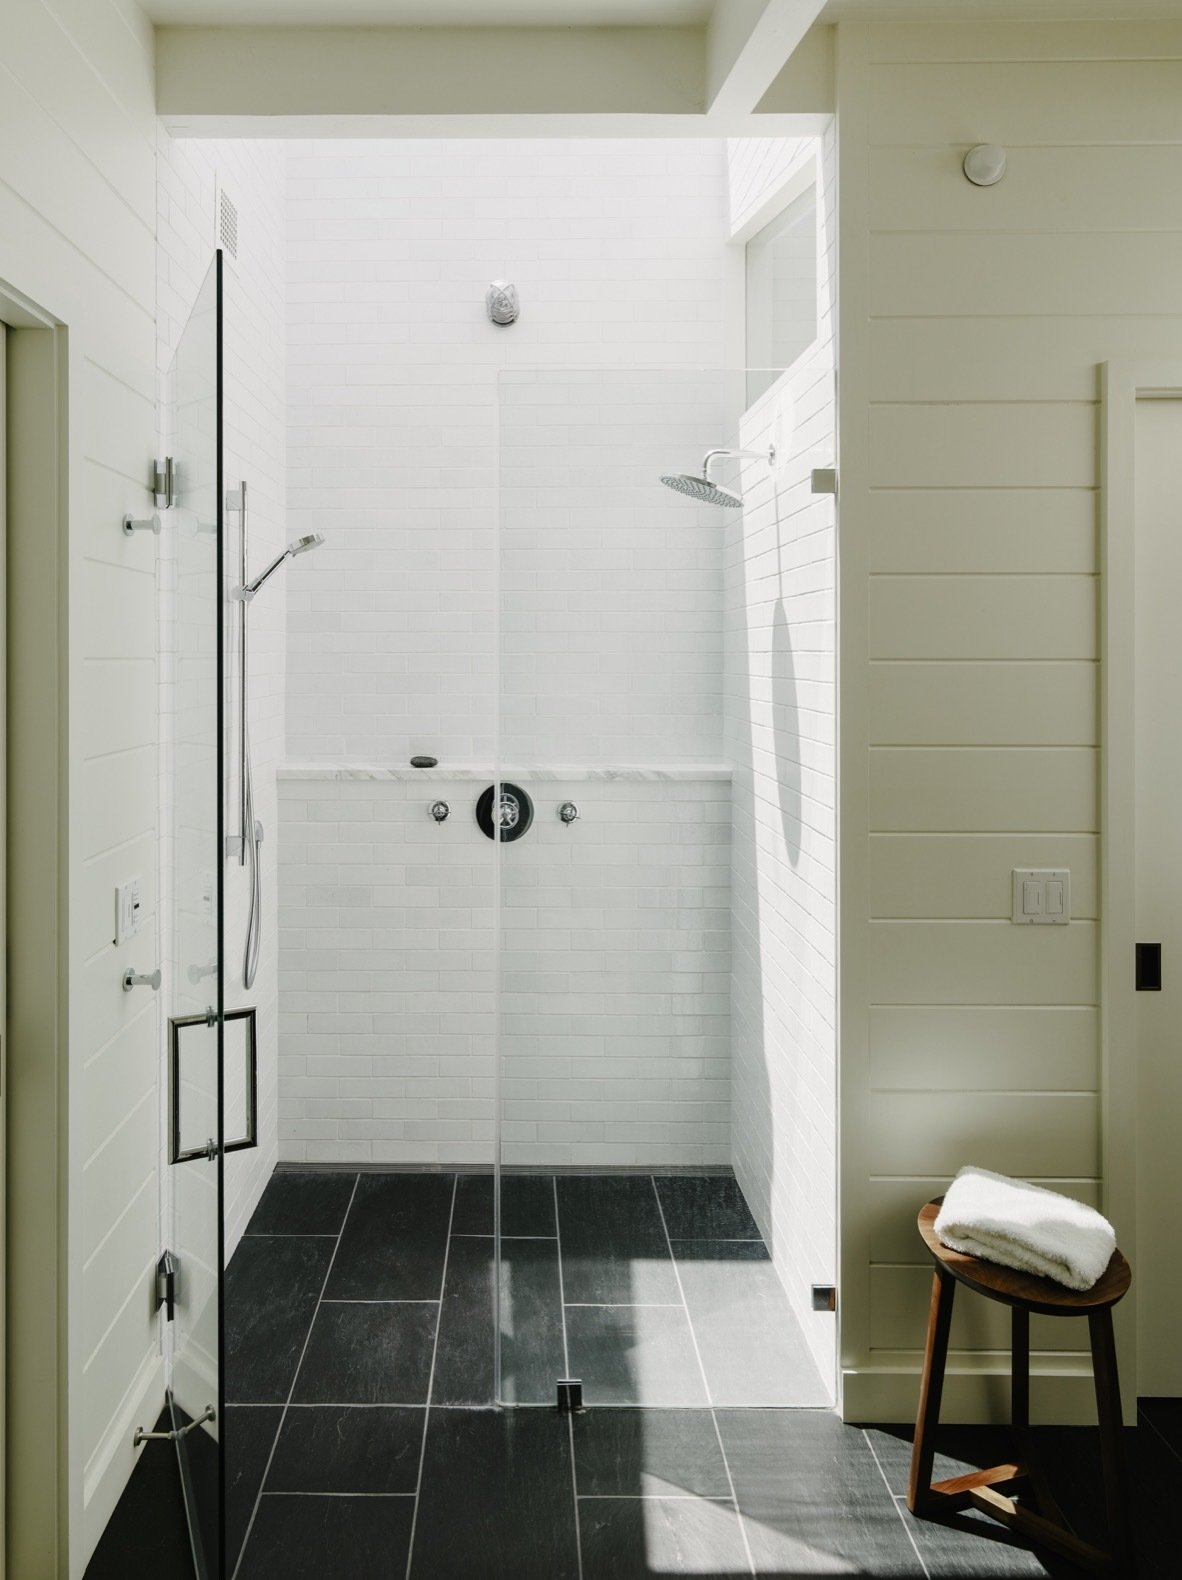 Portola Valley House master bathroom